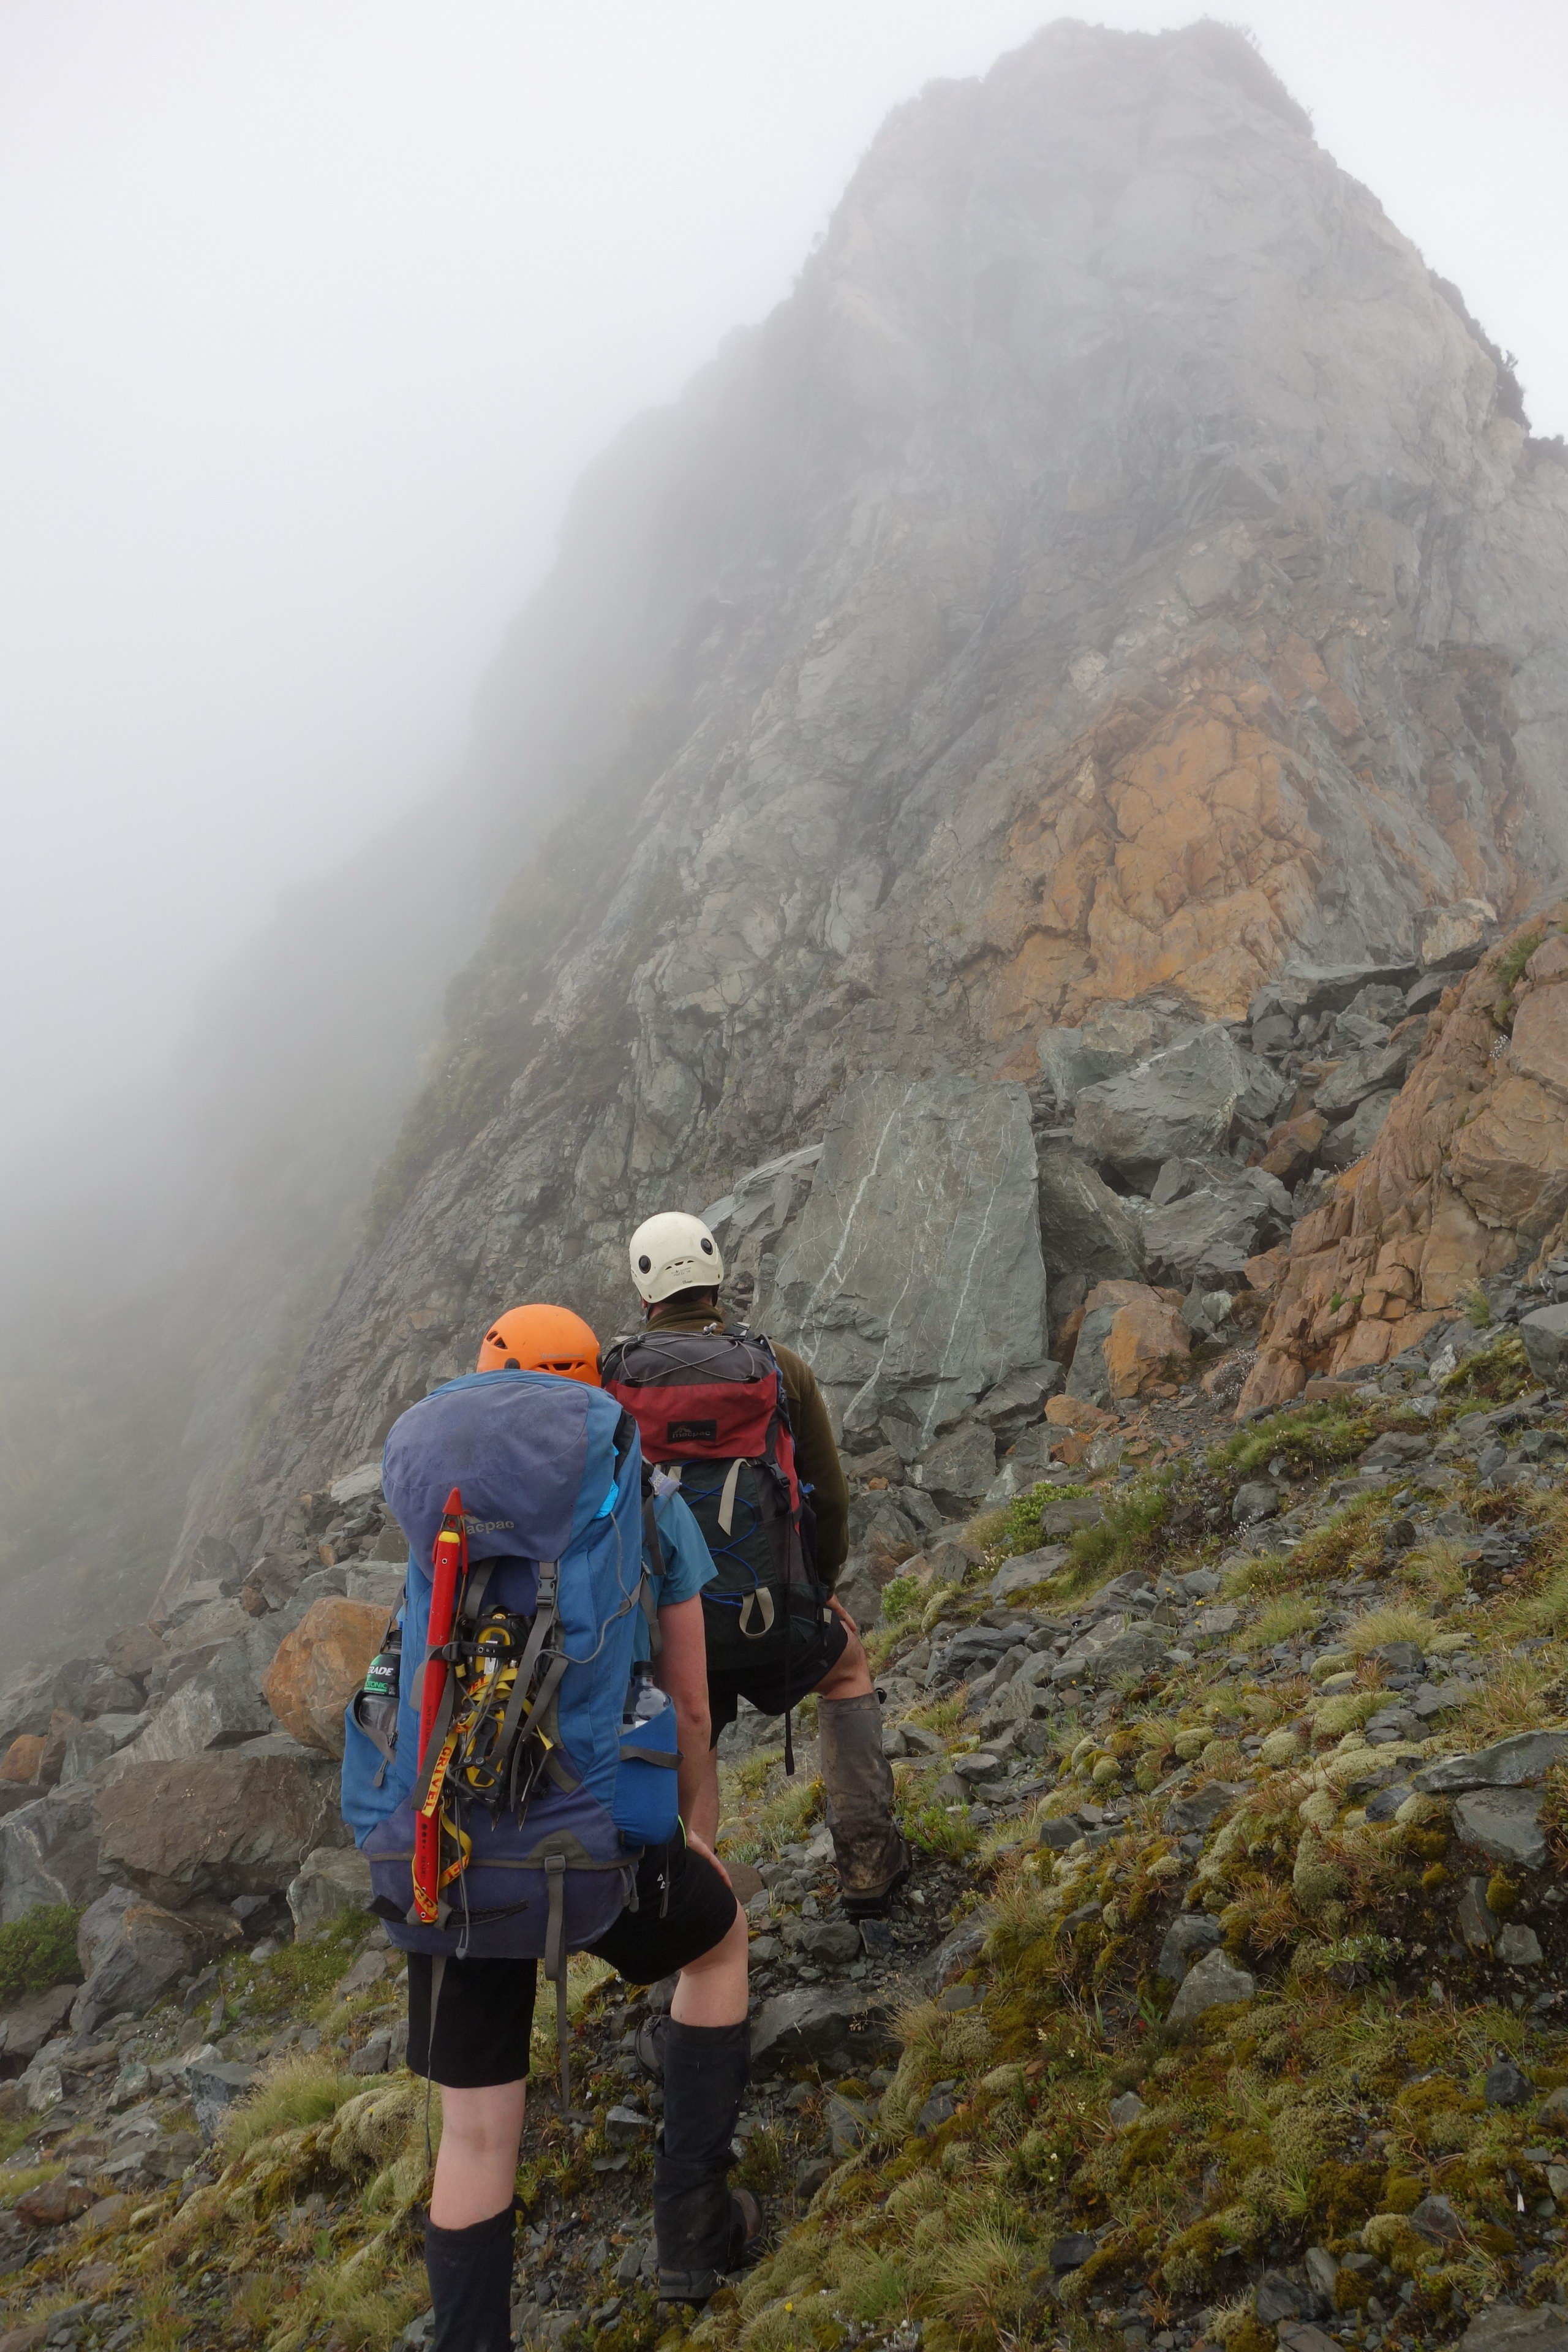 Jeremy and Hazel examine the ridge (Ball Pass Dec 2013)